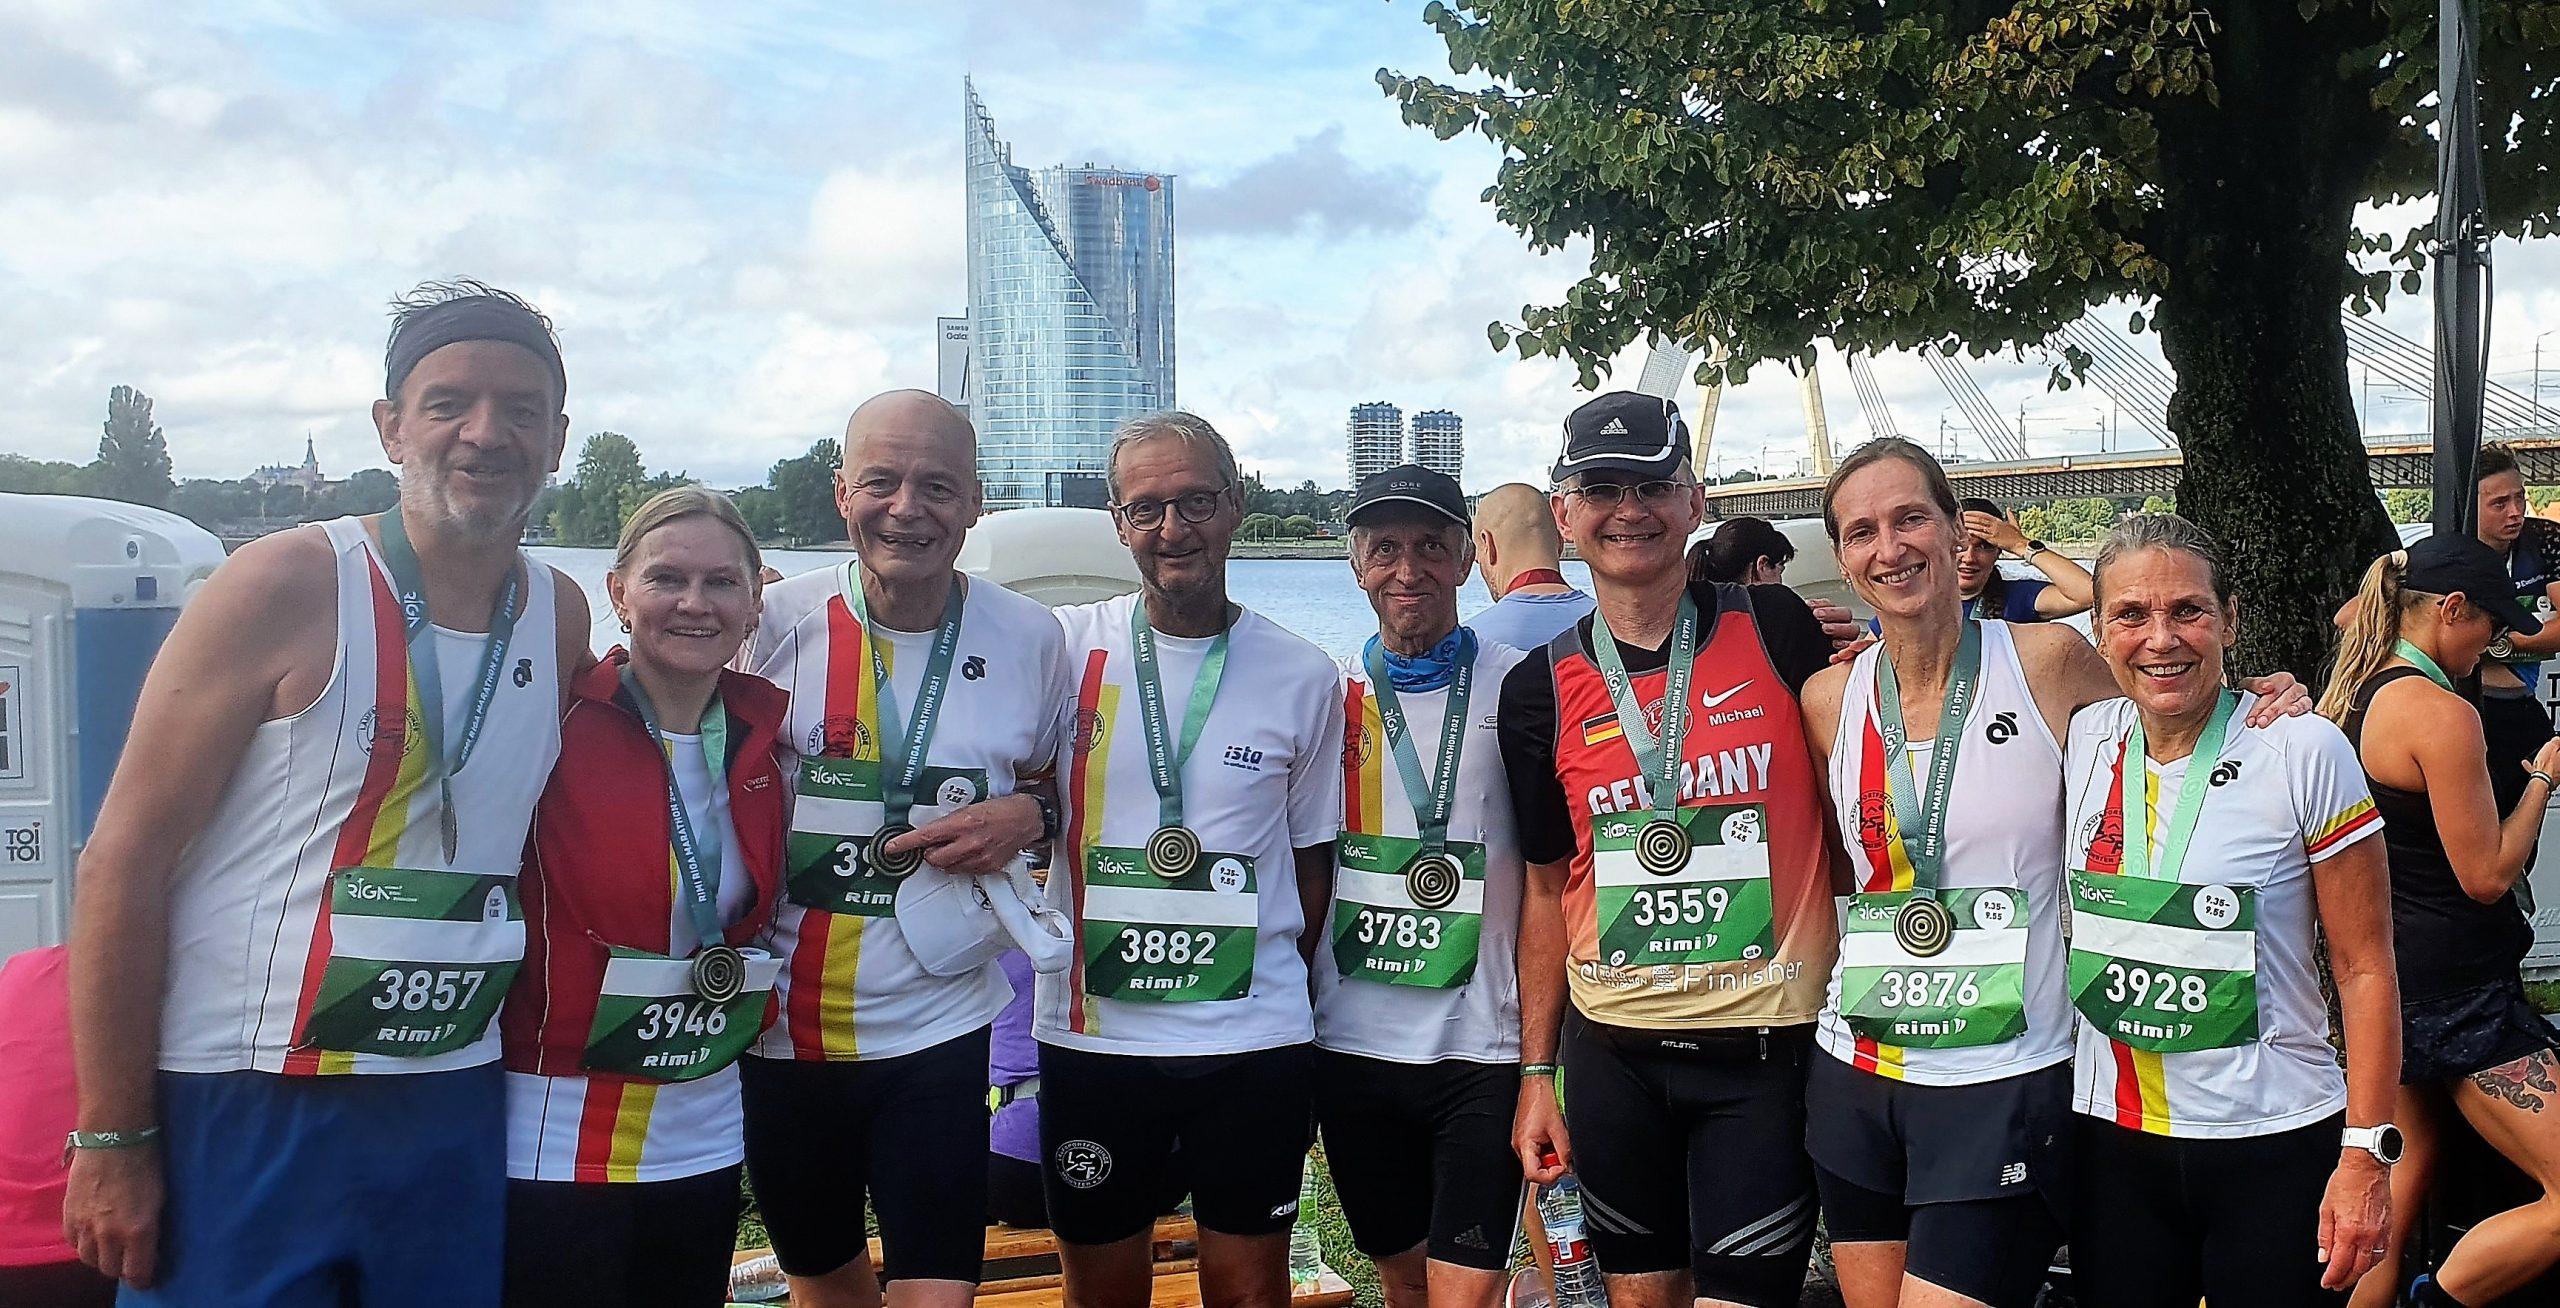 Rimi Riga Halbmarathon 2021 Finish